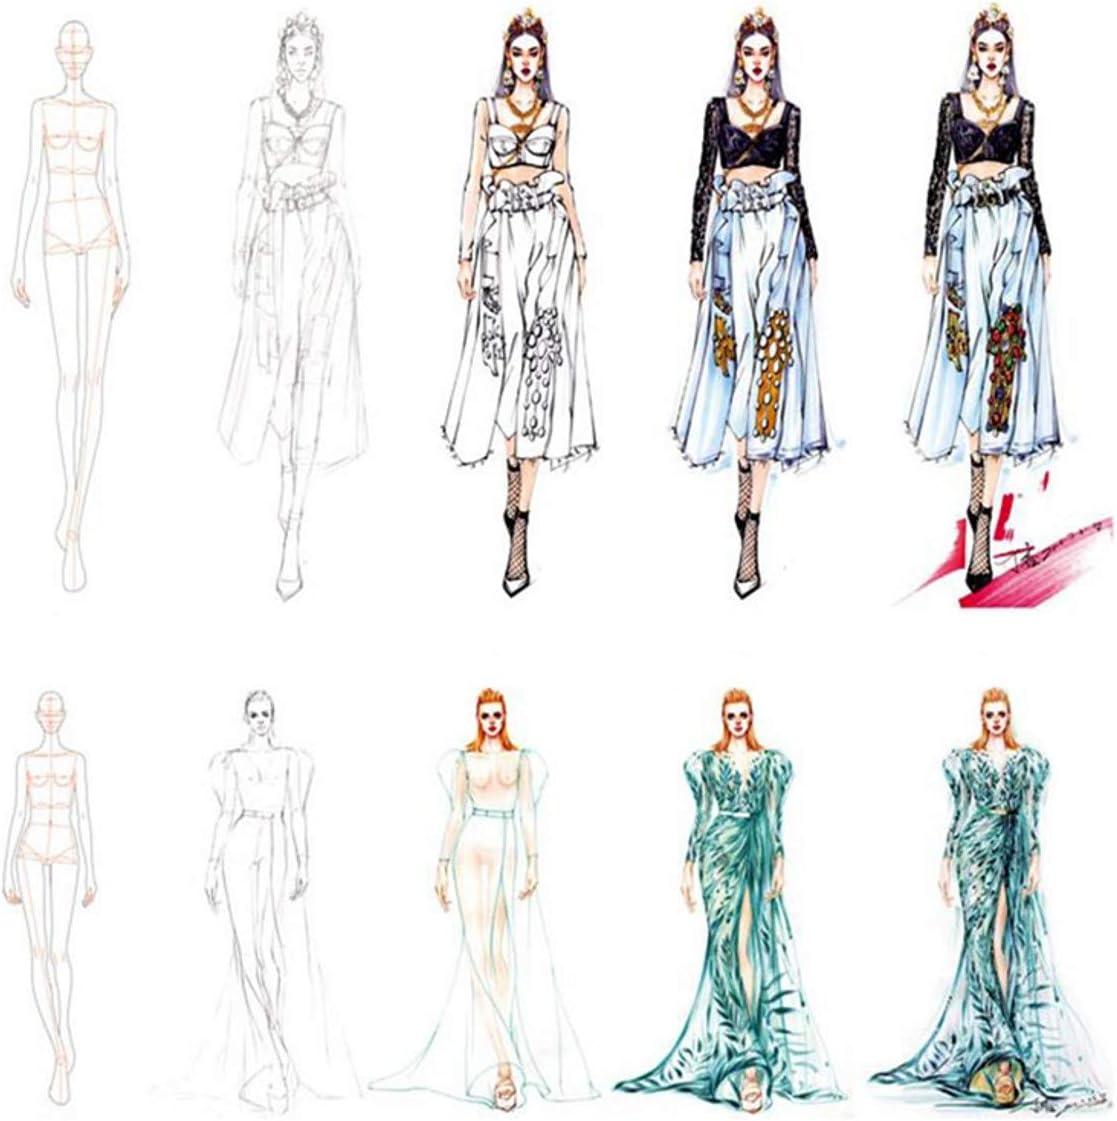 WellieSTR 3 Stlye Fashion Ruler Fashion Line Drawing Human Dynamic Template for Cloth Rendering